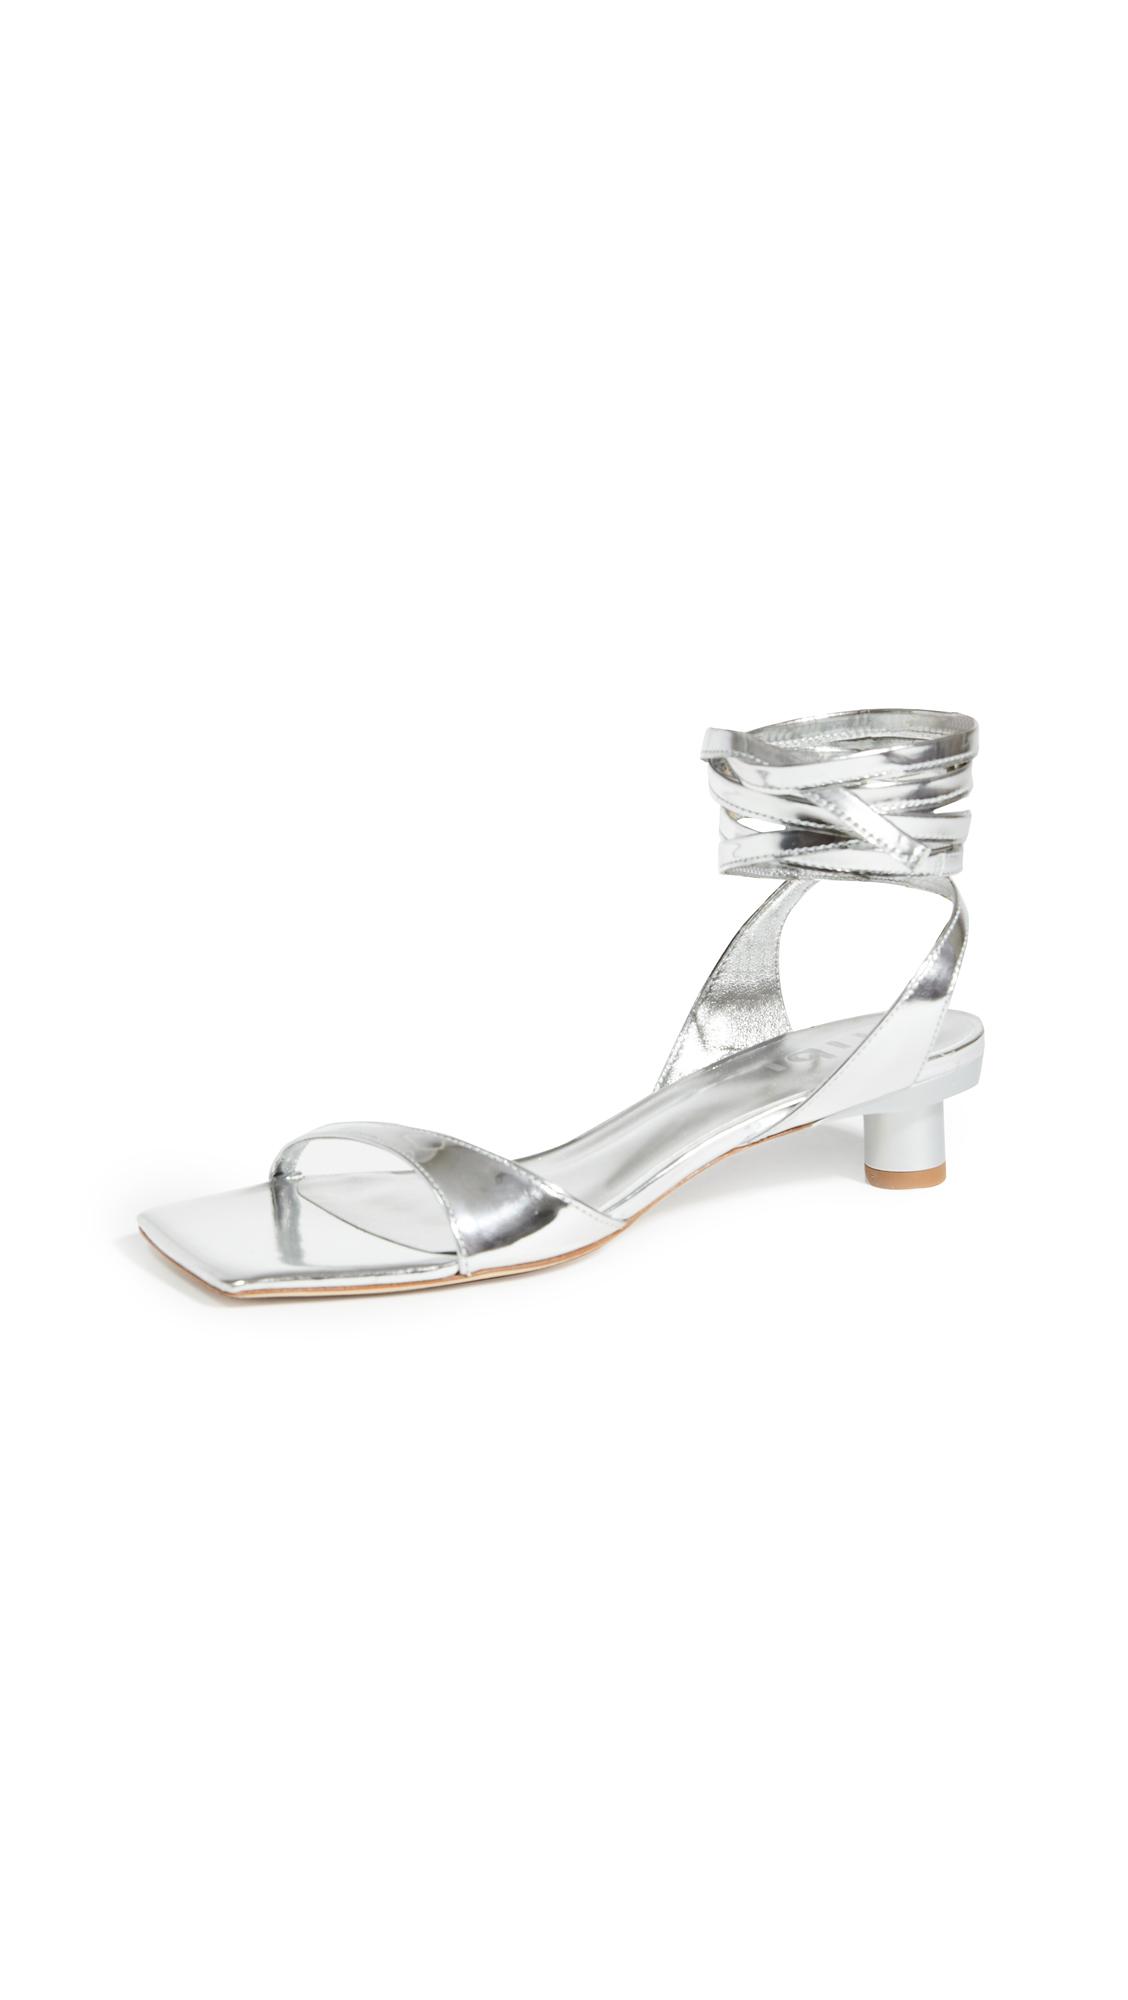 Tibi Jiro Metallic Sandals